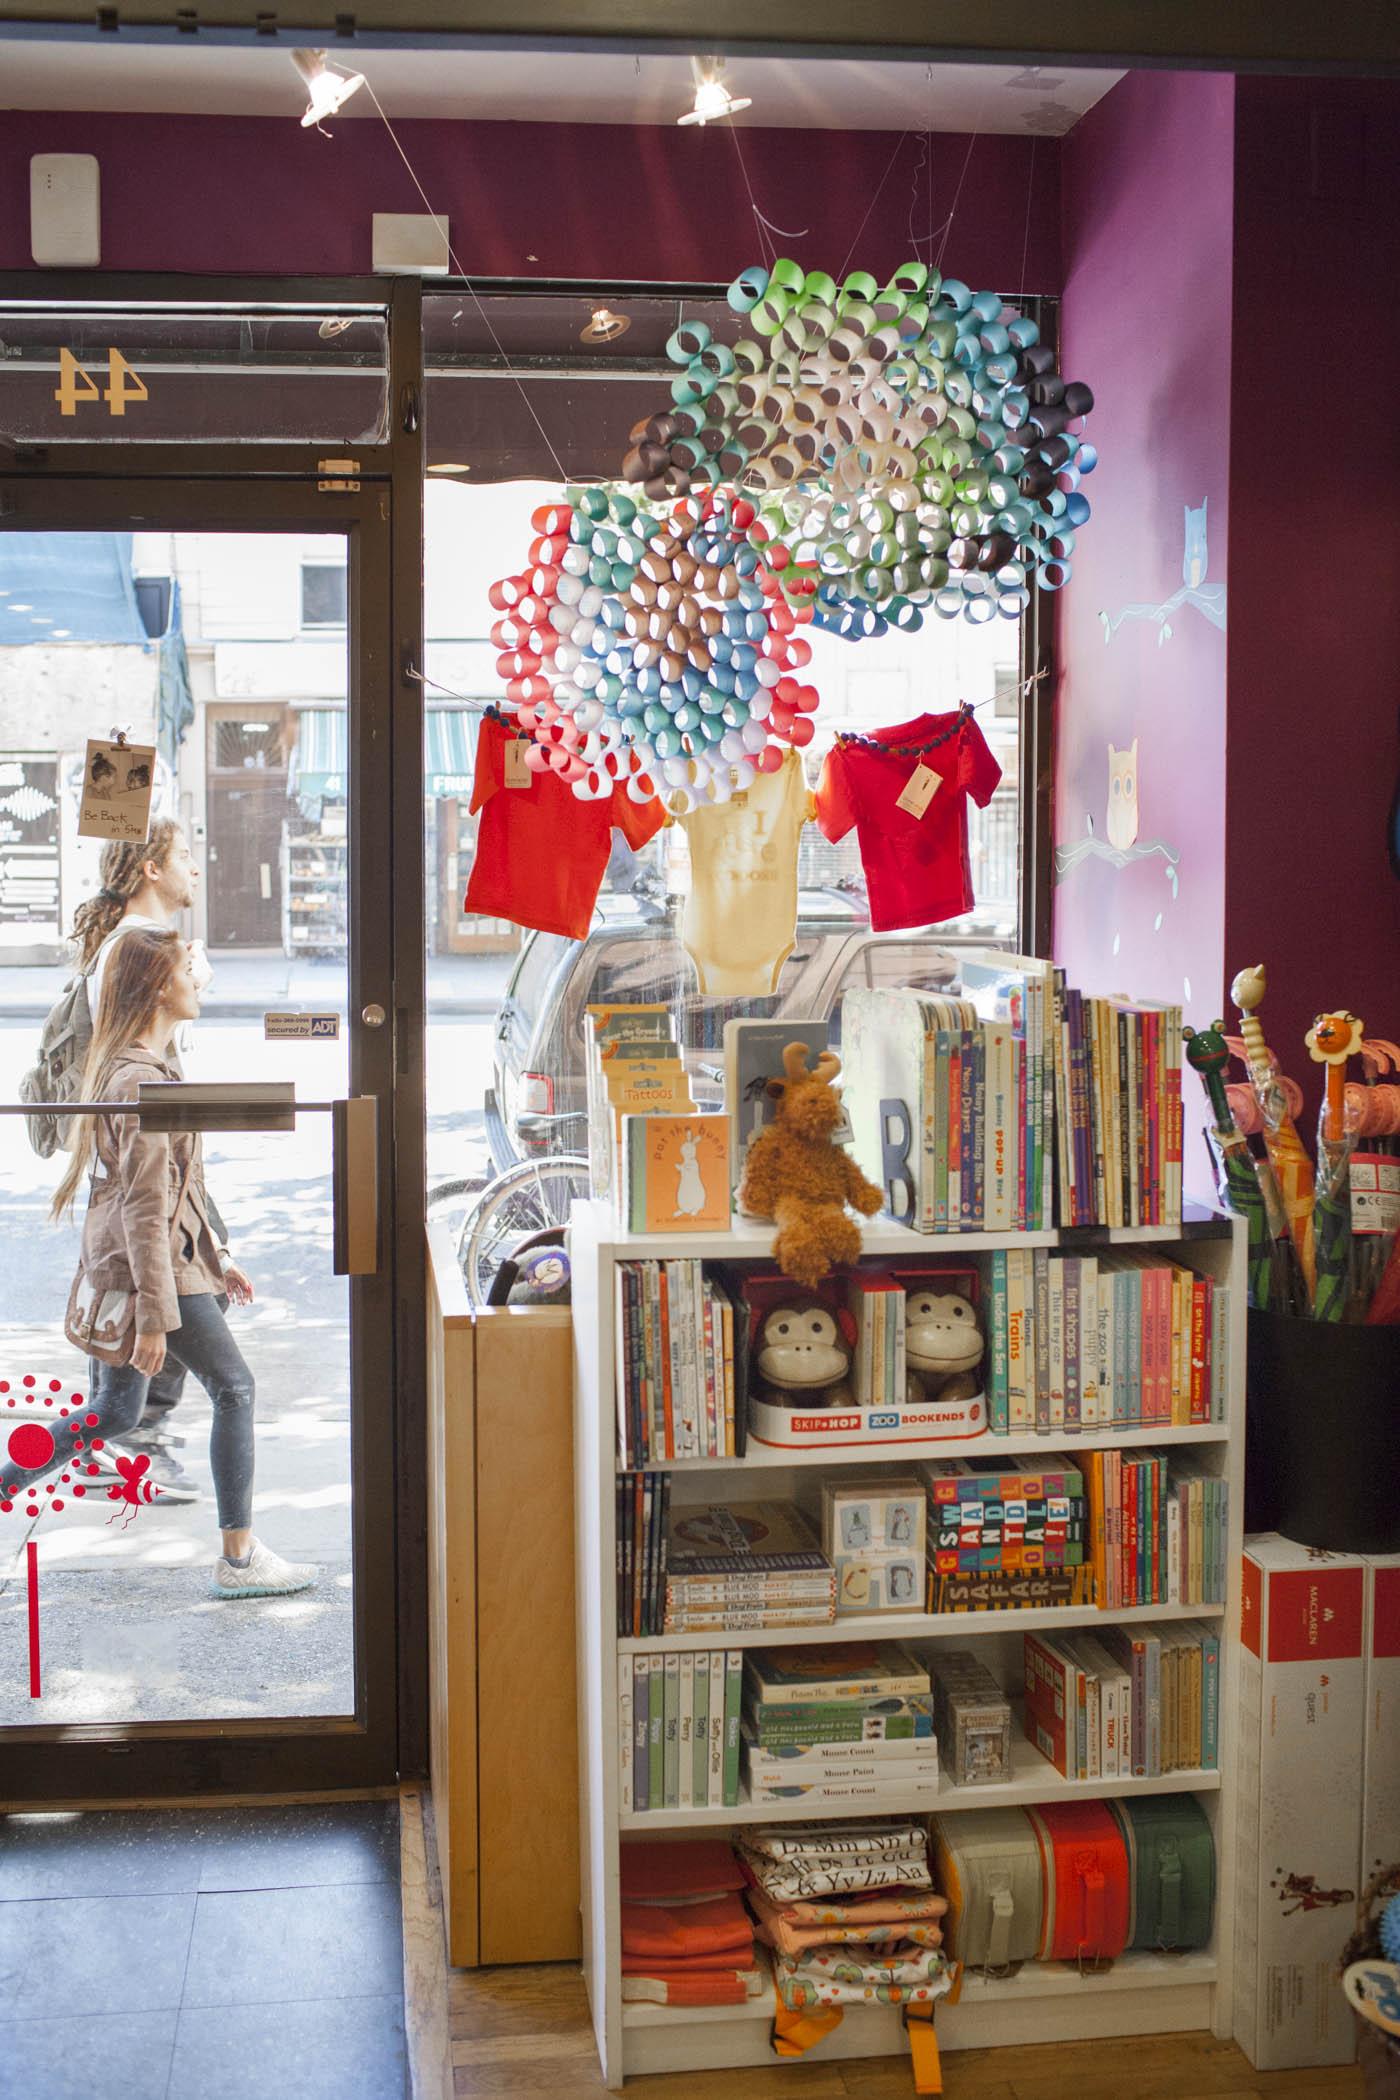 Liz Calvi, Photographer, Fine Art, Editorial Photography, Advertising Photography, London Photographer, Small Business Saturday, American Express, Park Slope NYC, Brooklyn,Brand Narrative